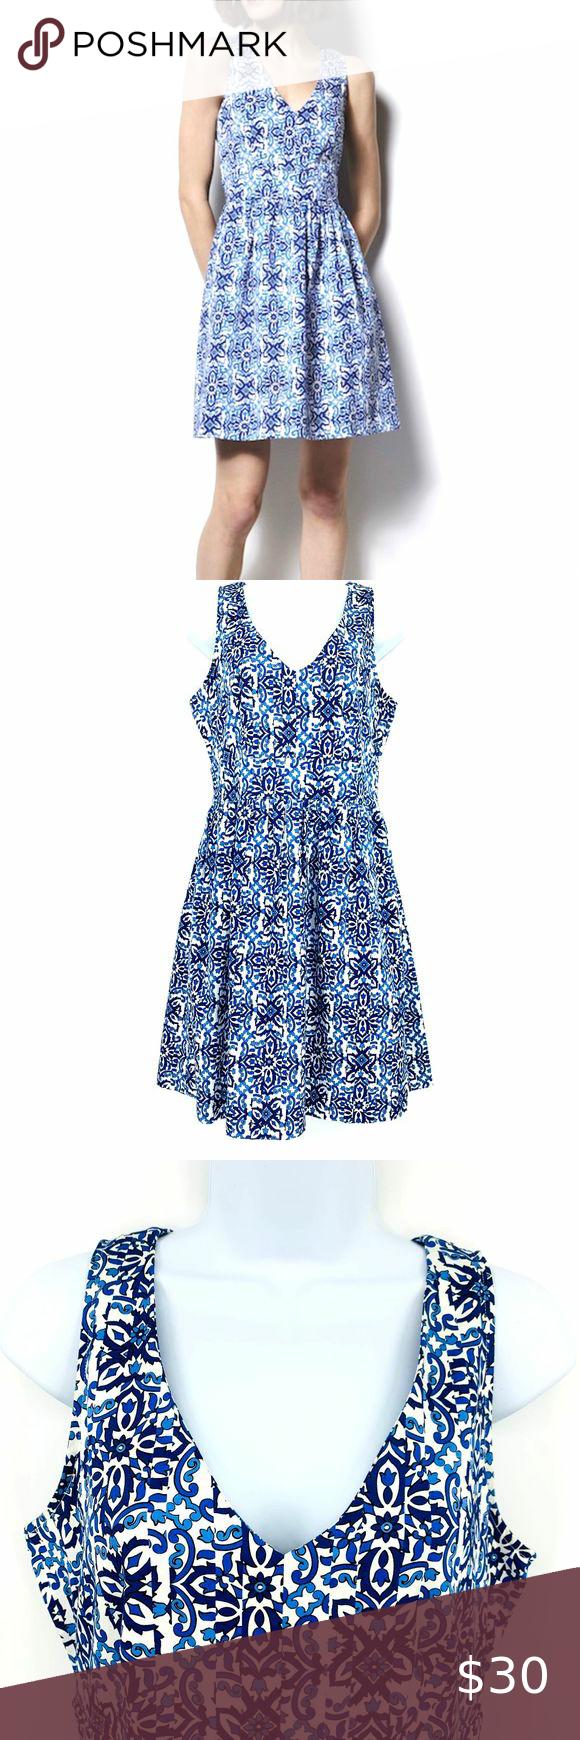 Milly Capri Italia Blue White Dutch Tulip Dress Tulip Dress Clothes Design Dresses [ 1740 x 580 Pixel ]